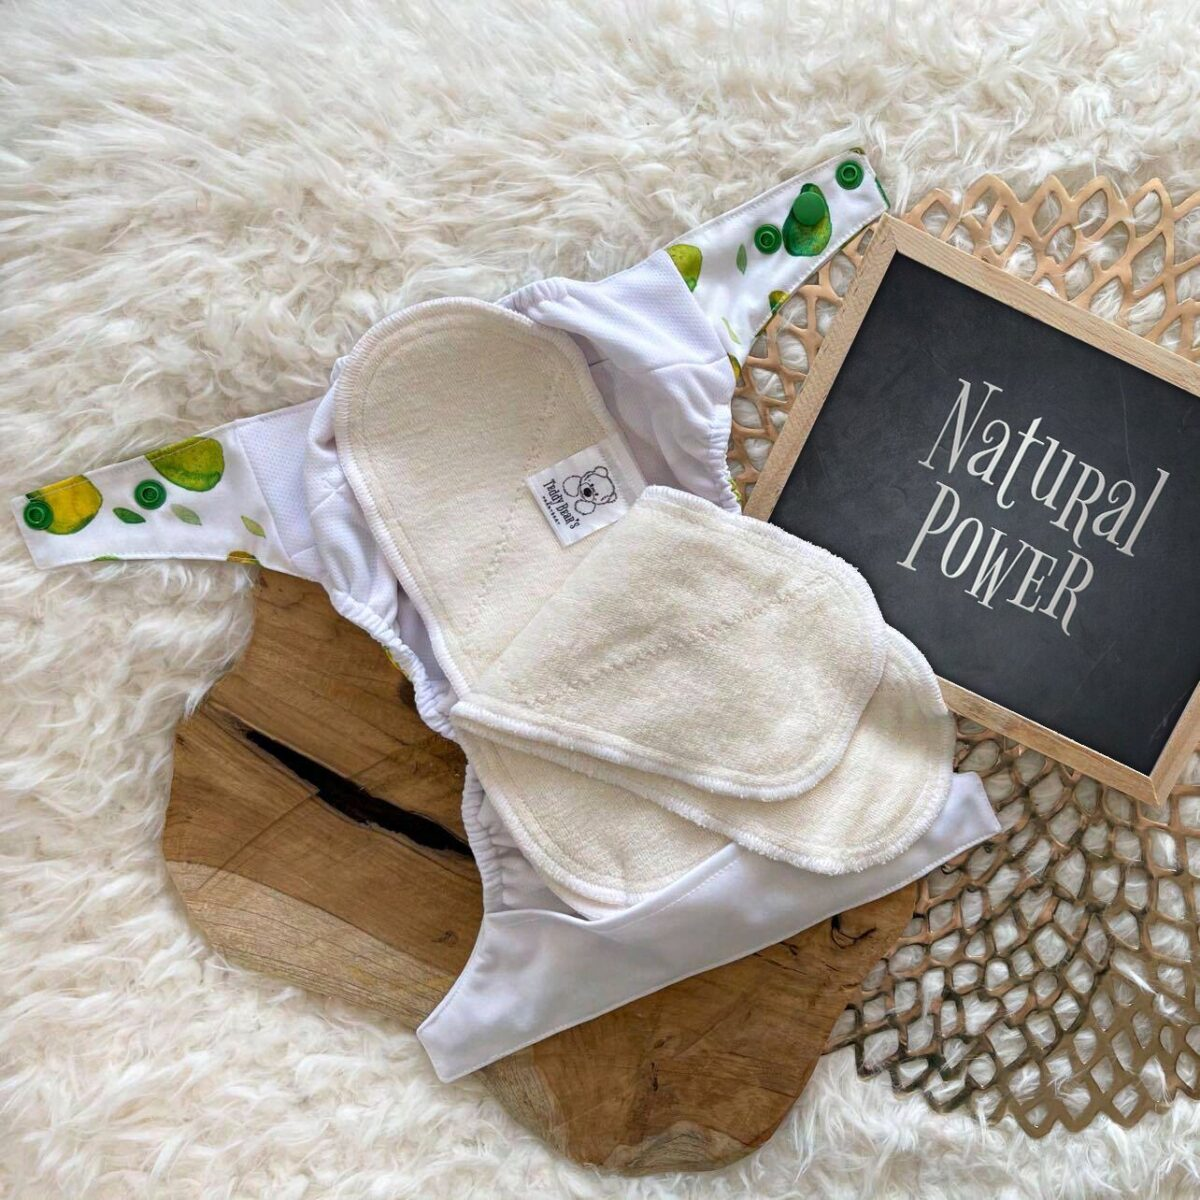 Natural Power wklad2